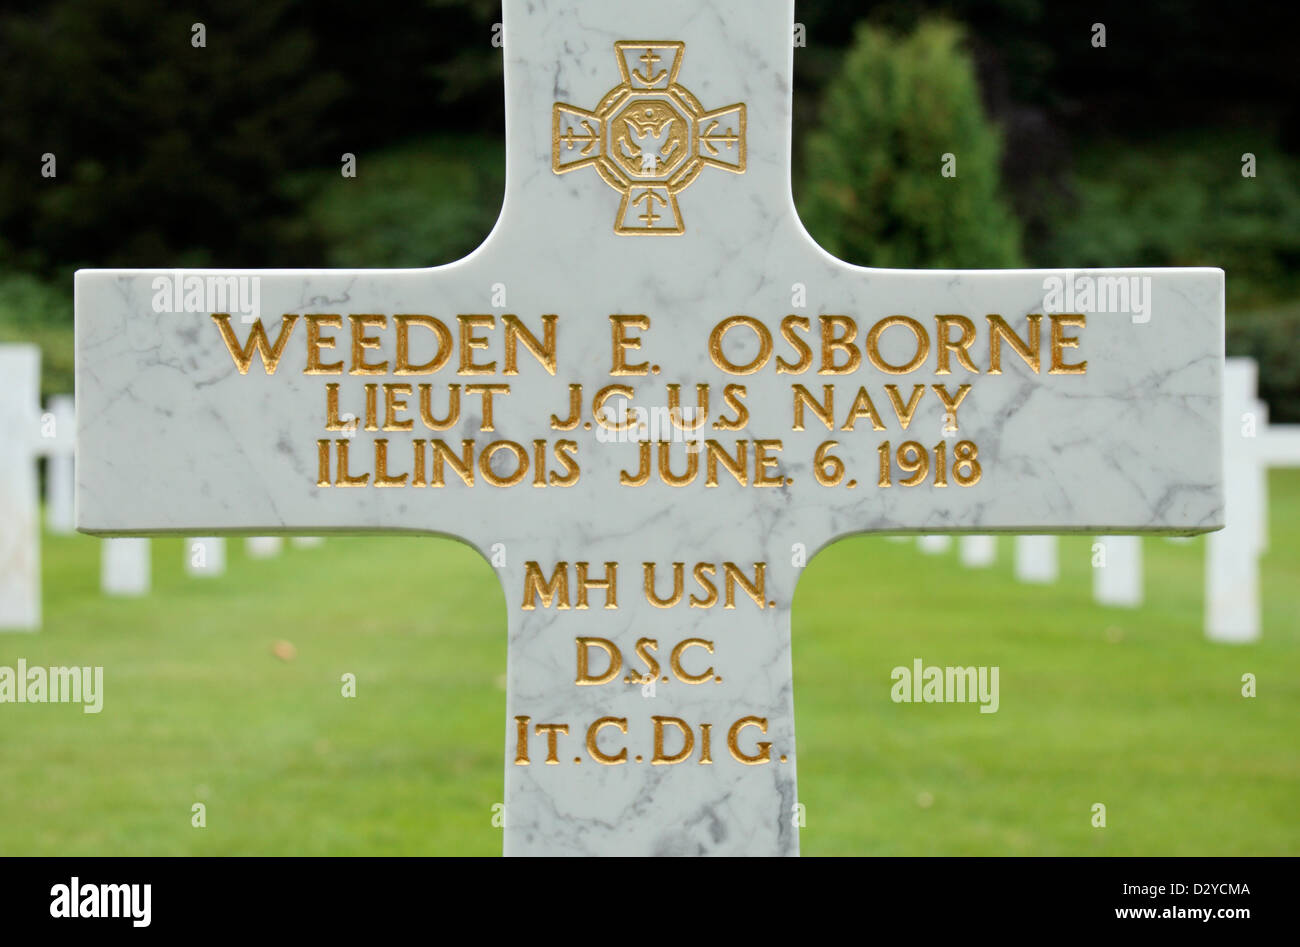 Medal of honor headstone of weeden e osborne mh usn dsc itcdi g medal of honor headstone of weeden e osborne mh usn dsc itcdi g aisne marne american cemetery and memorial belleau france buycottarizona